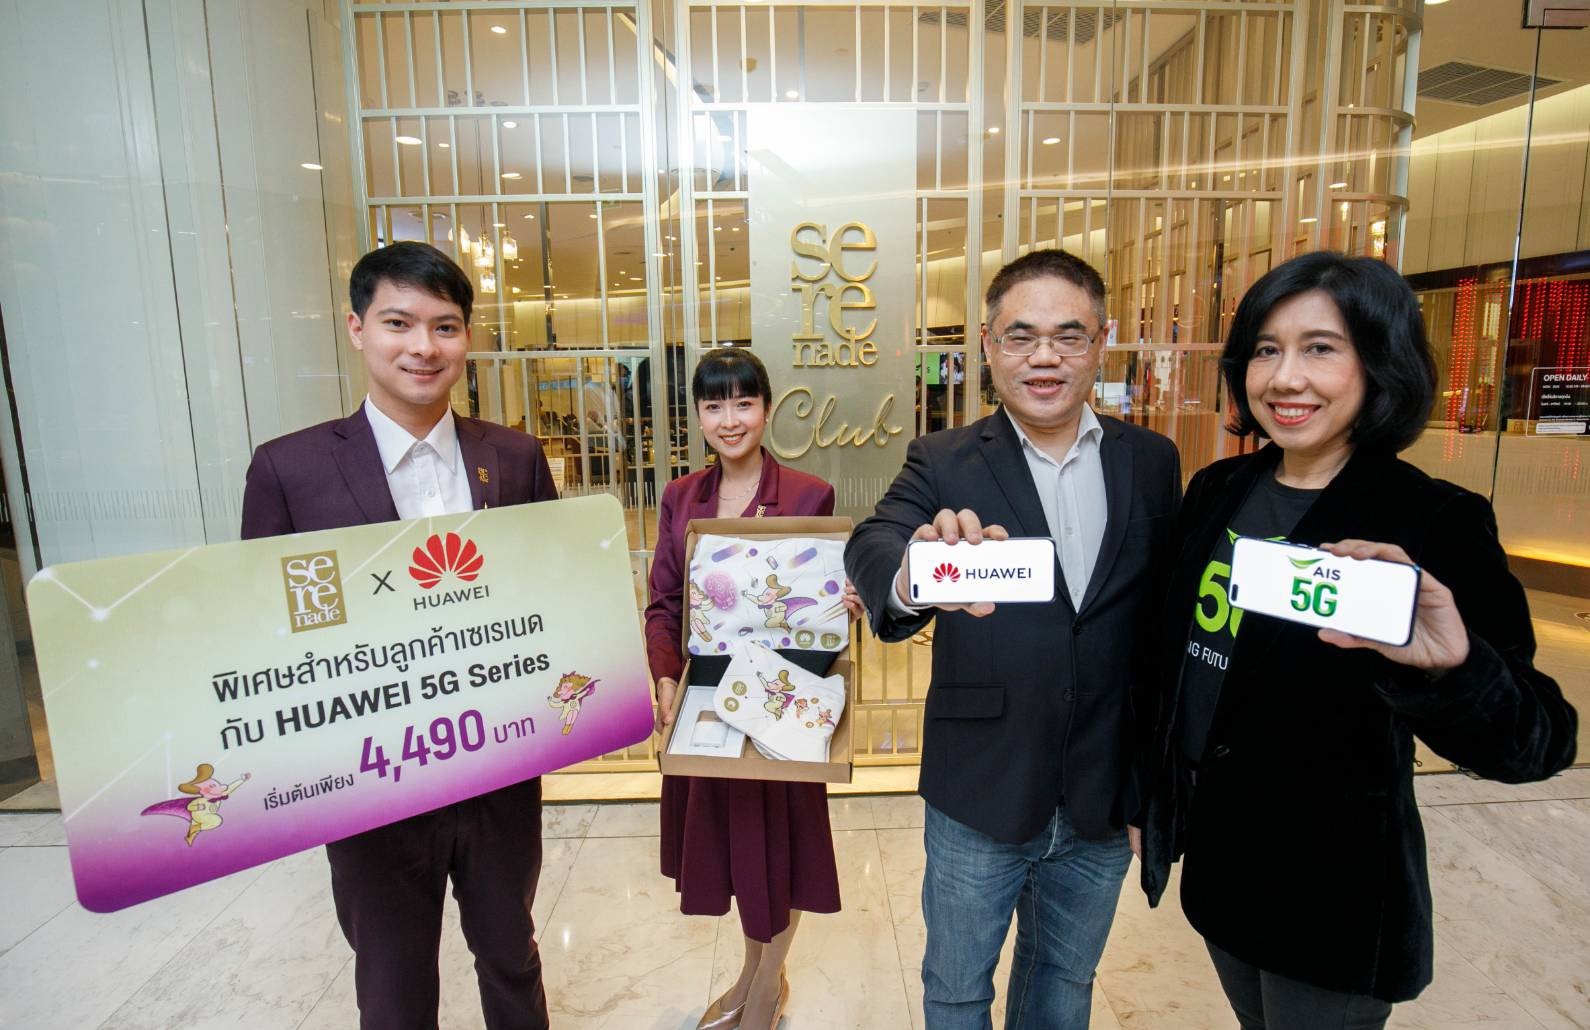 AIS Serenade x HUAWEI ย้ำความเป็น Strategic Partner ผุดแคมเปญใหม่สมาร์ทโฟน 5G ตอบรับเทรนด์ Digital Urban Lifestyle